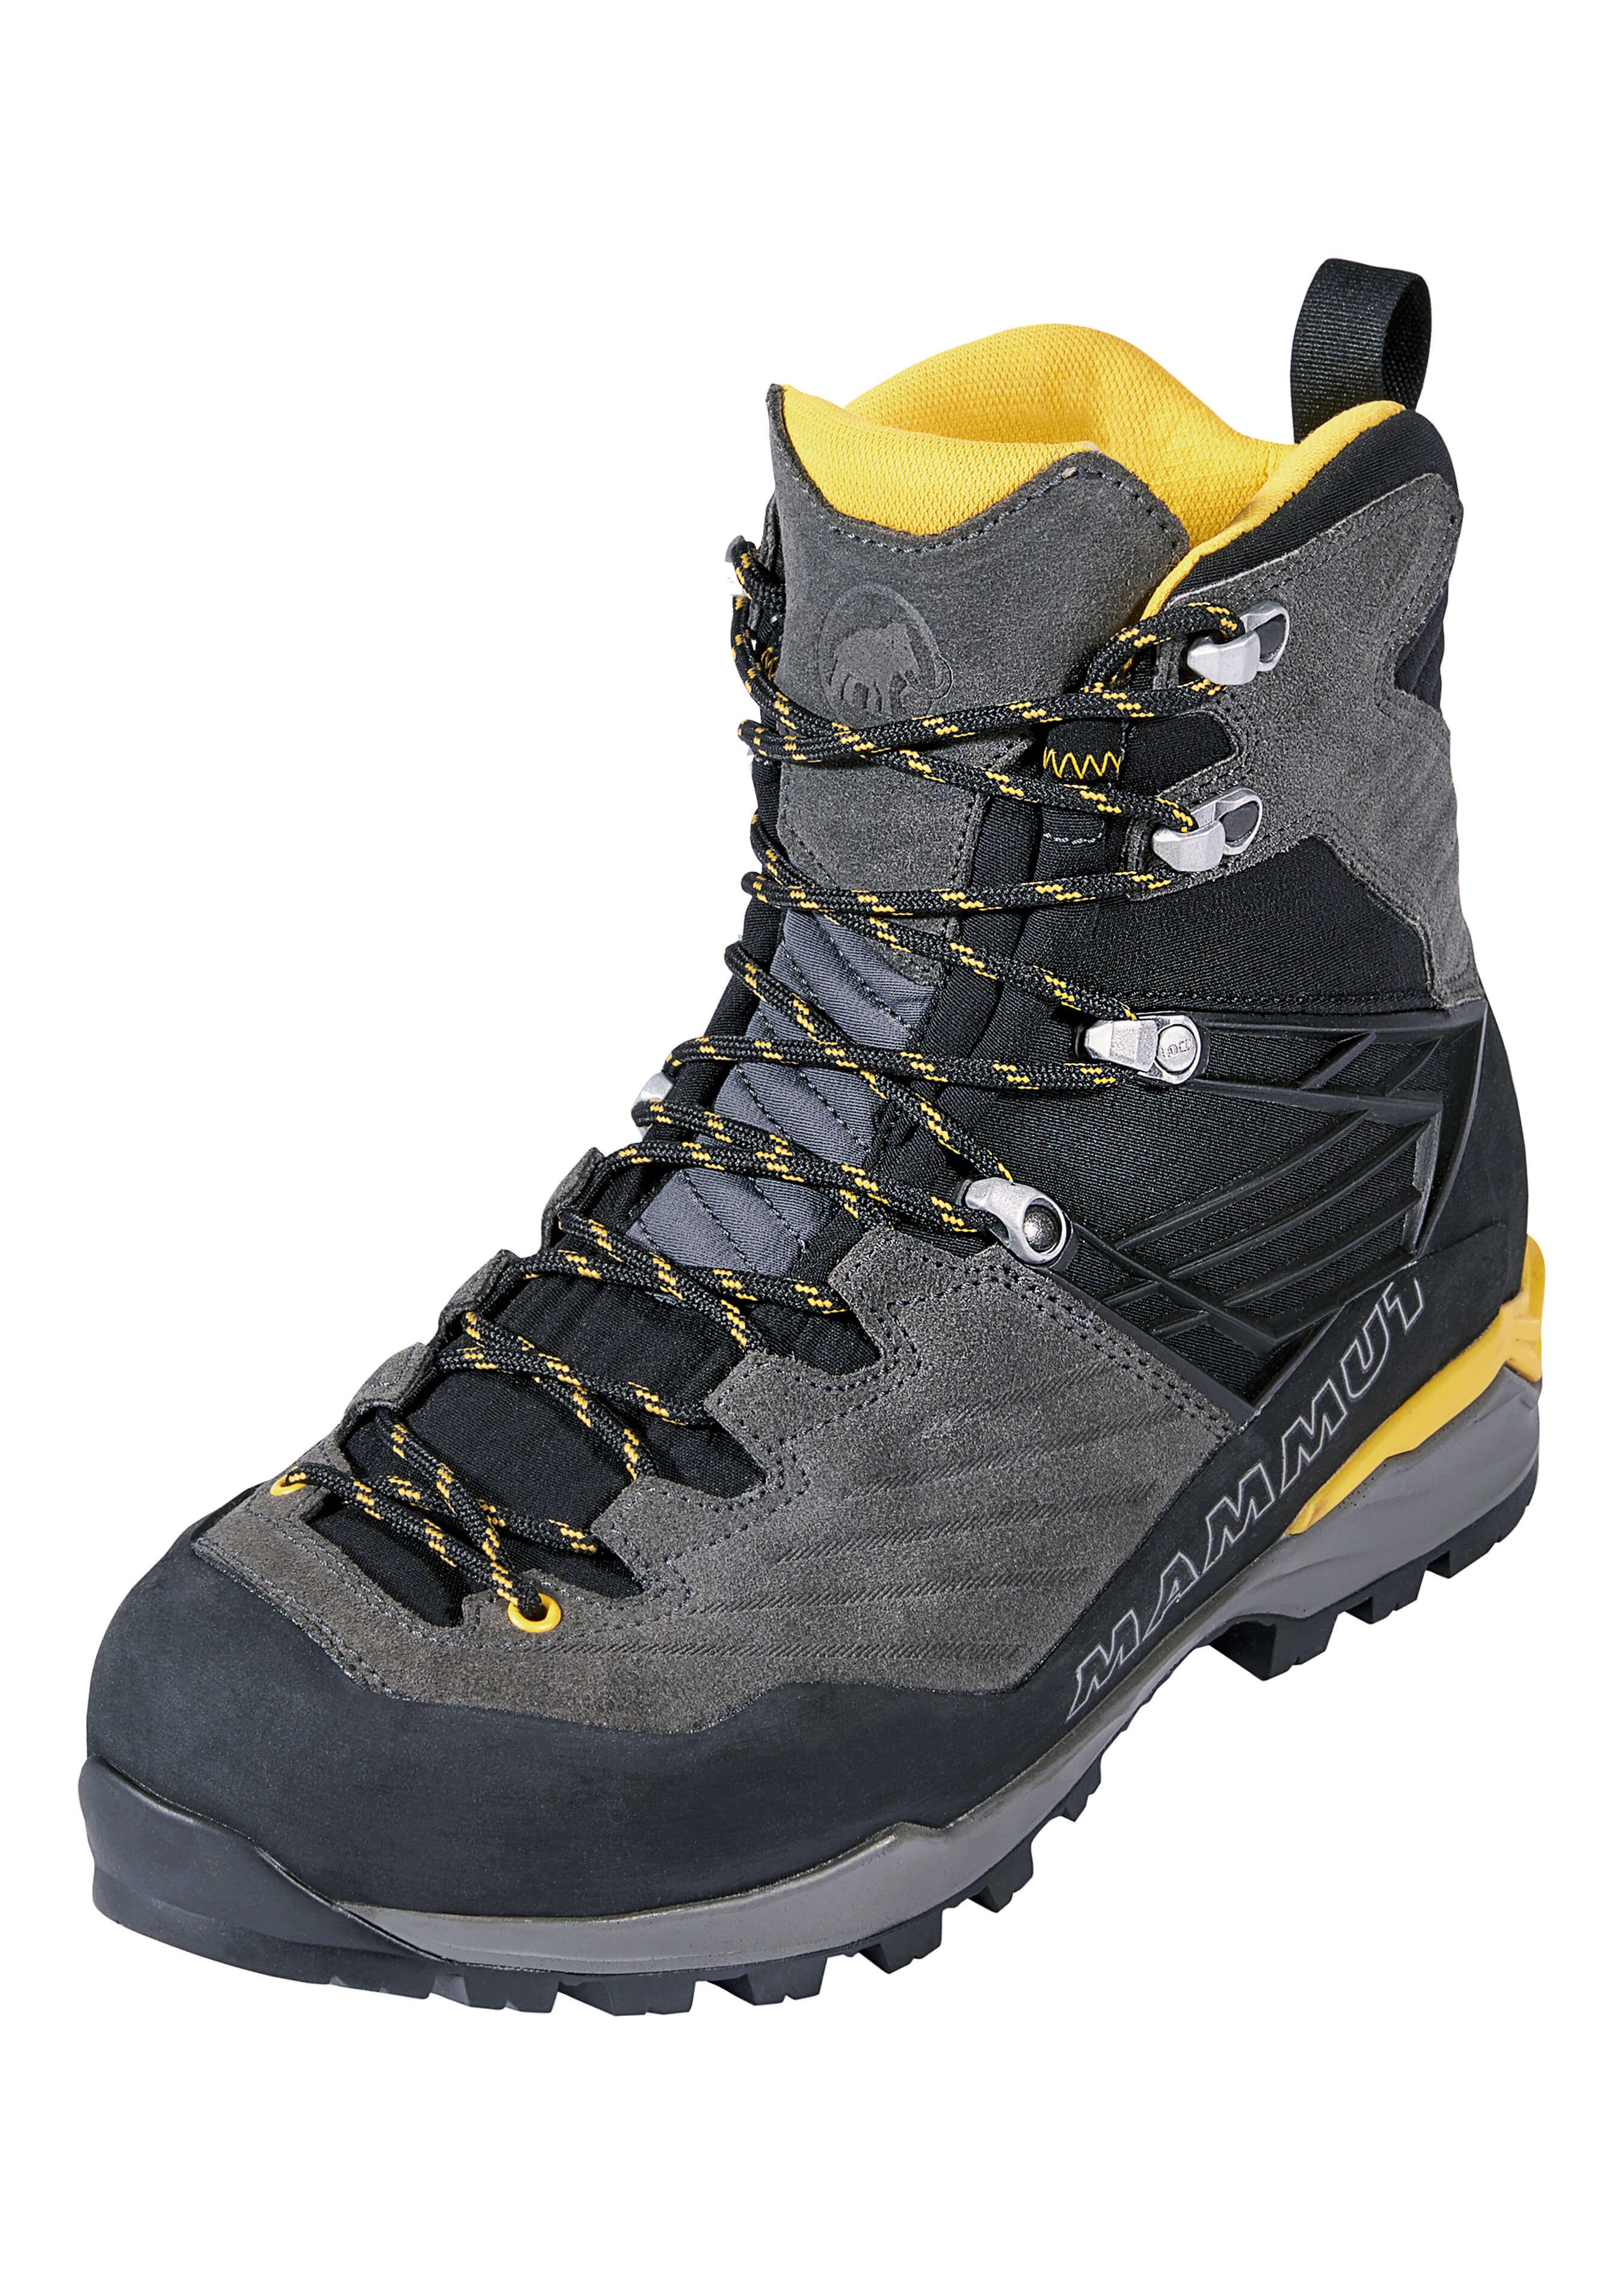 Chaussure alpine de travail Kento Pro 42291210 1